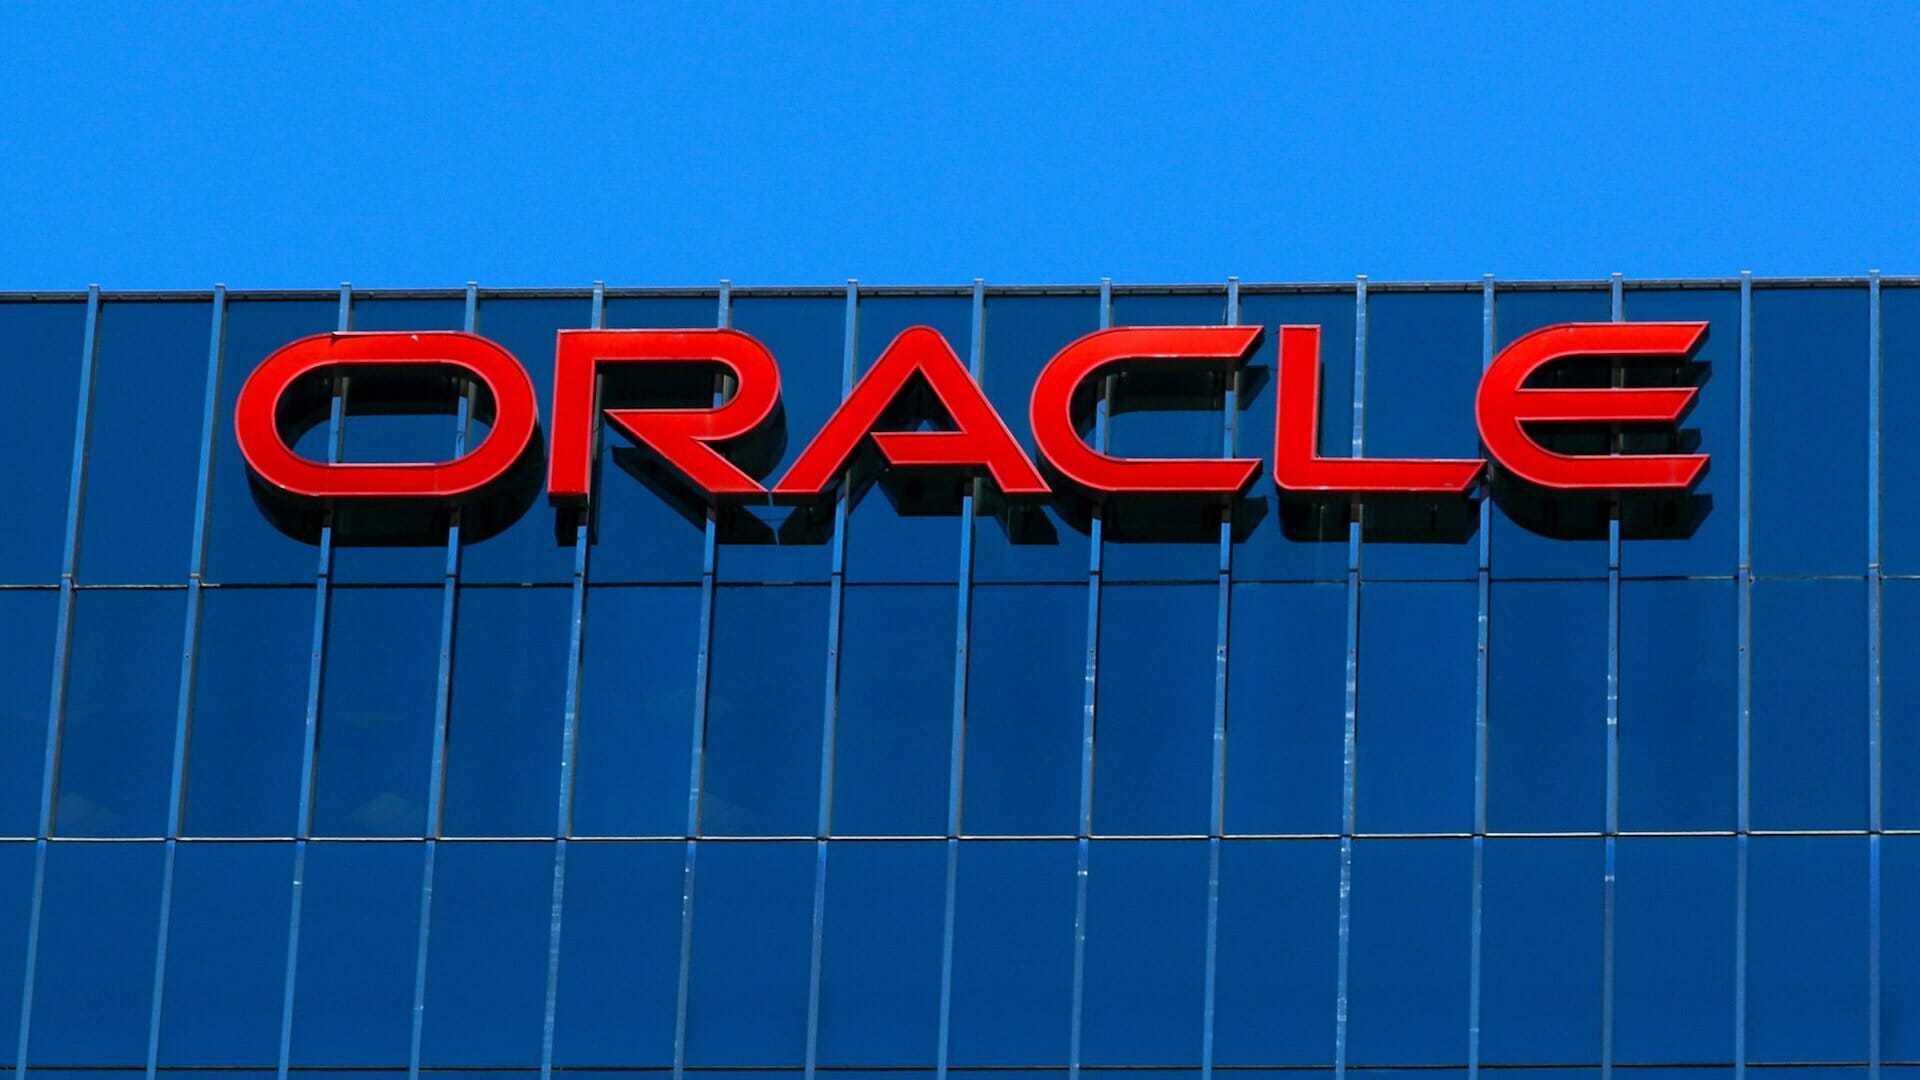 Oracle | Technology Brands Worldwide in 2020